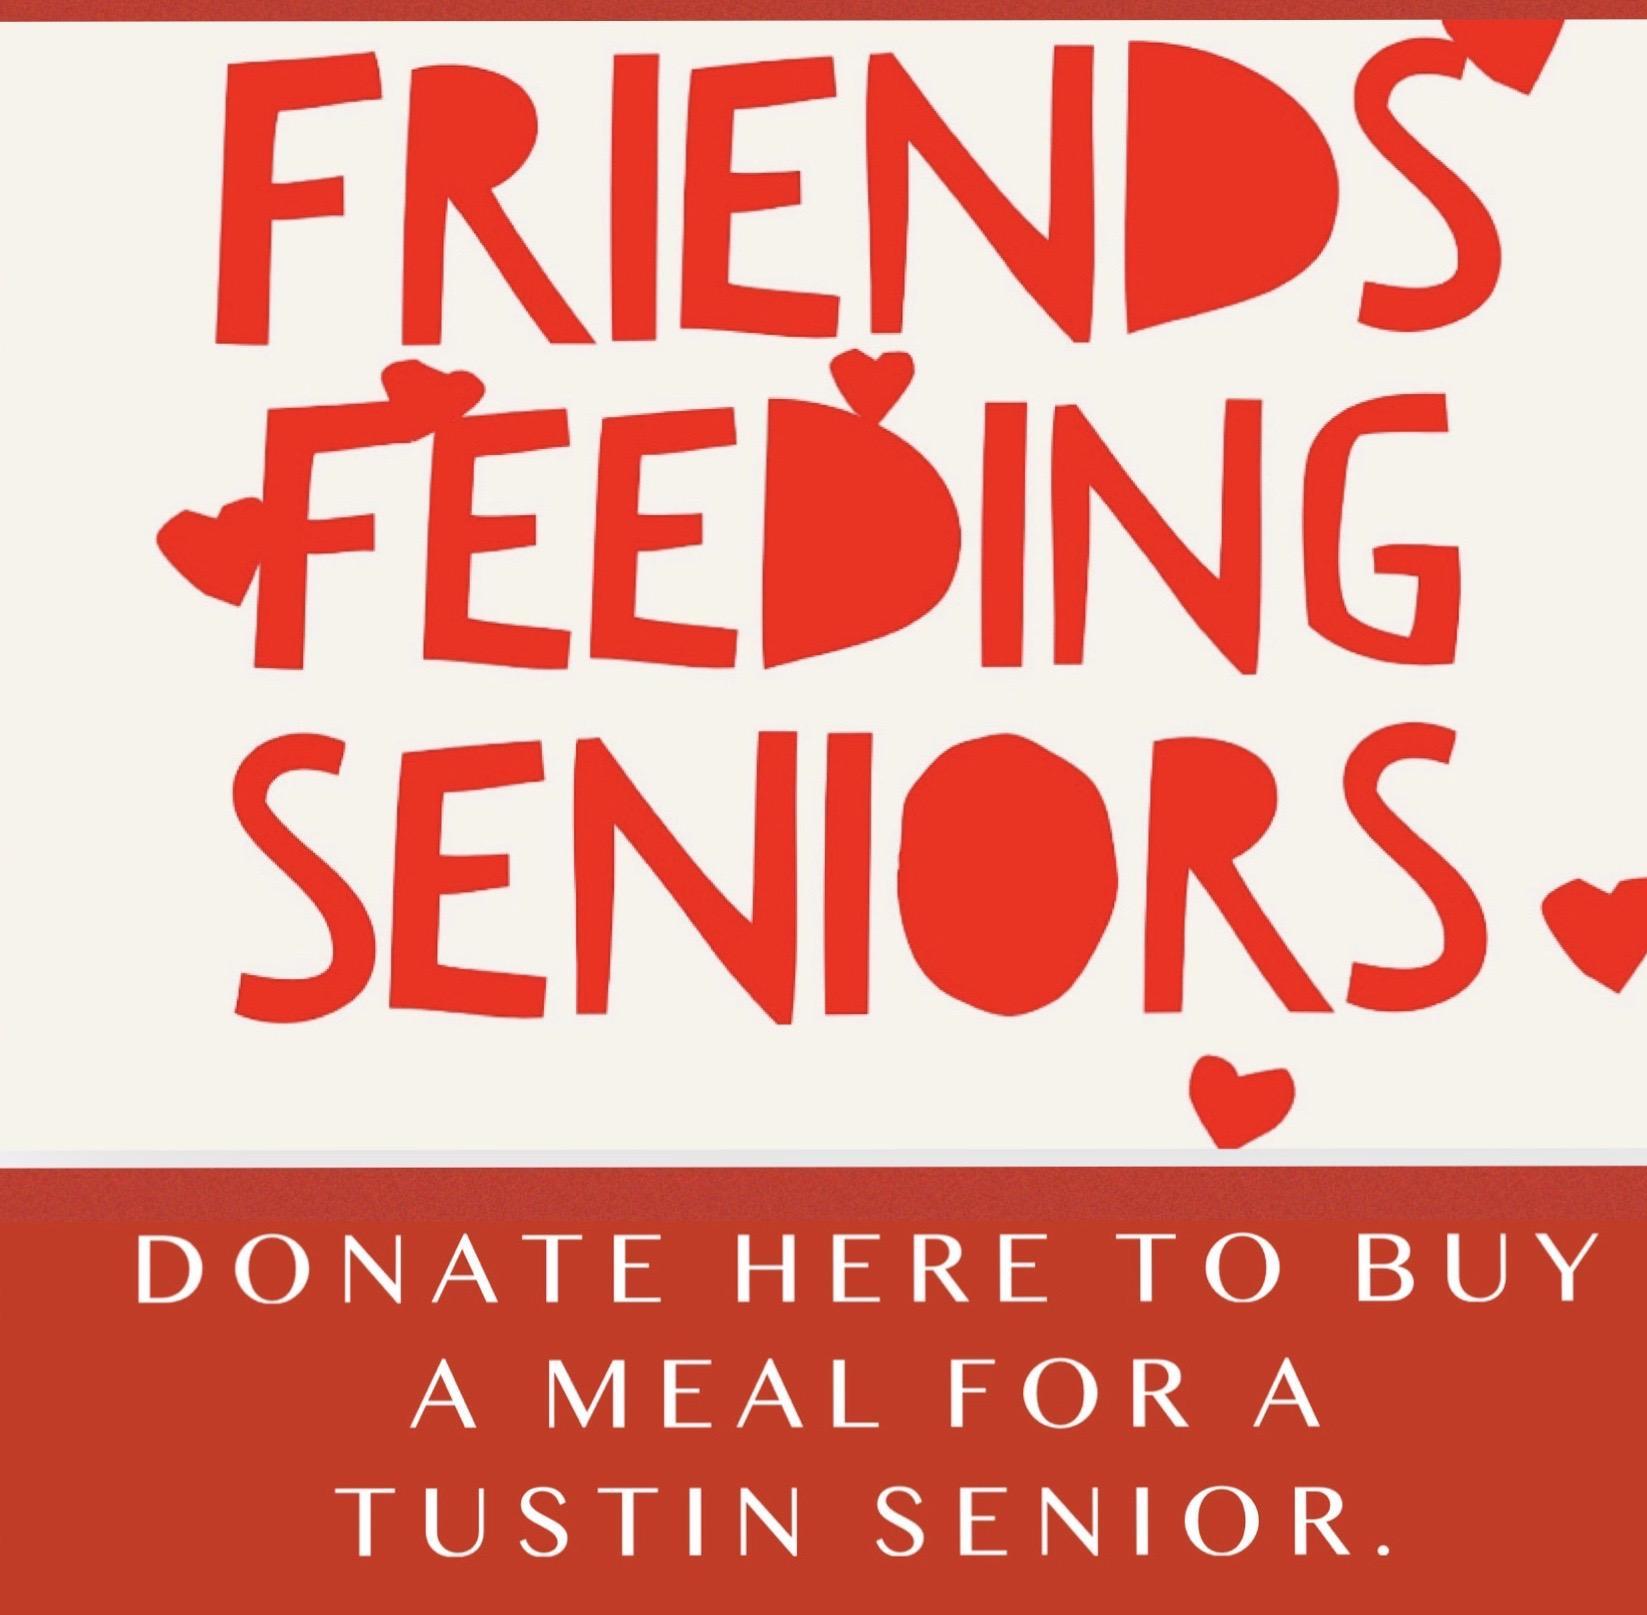 feeding 1 Senior at a time